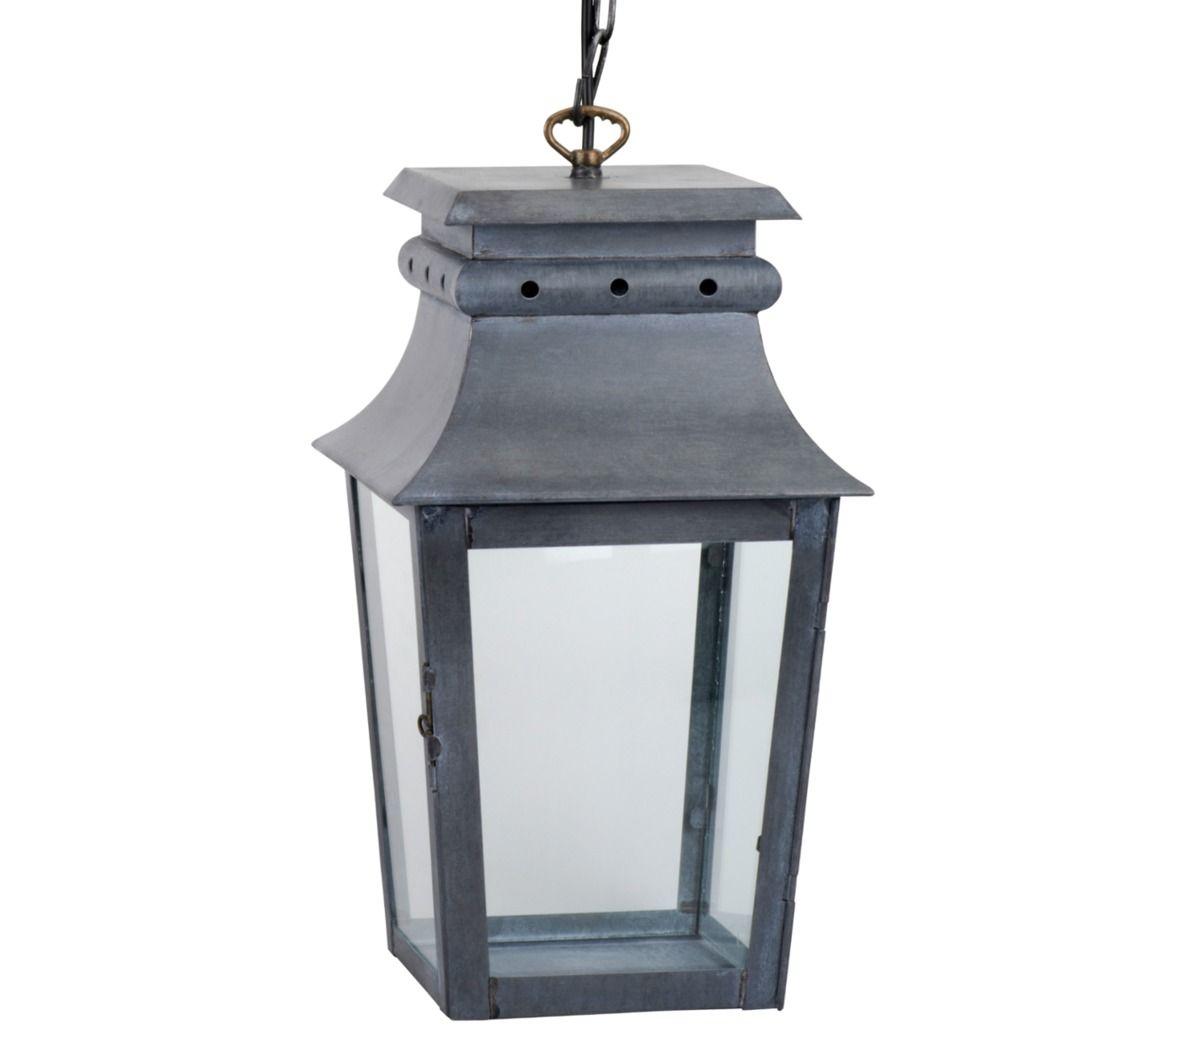 french house lighting. Lighting \u003e Pendant Ussé Hanging Lantern - The French House